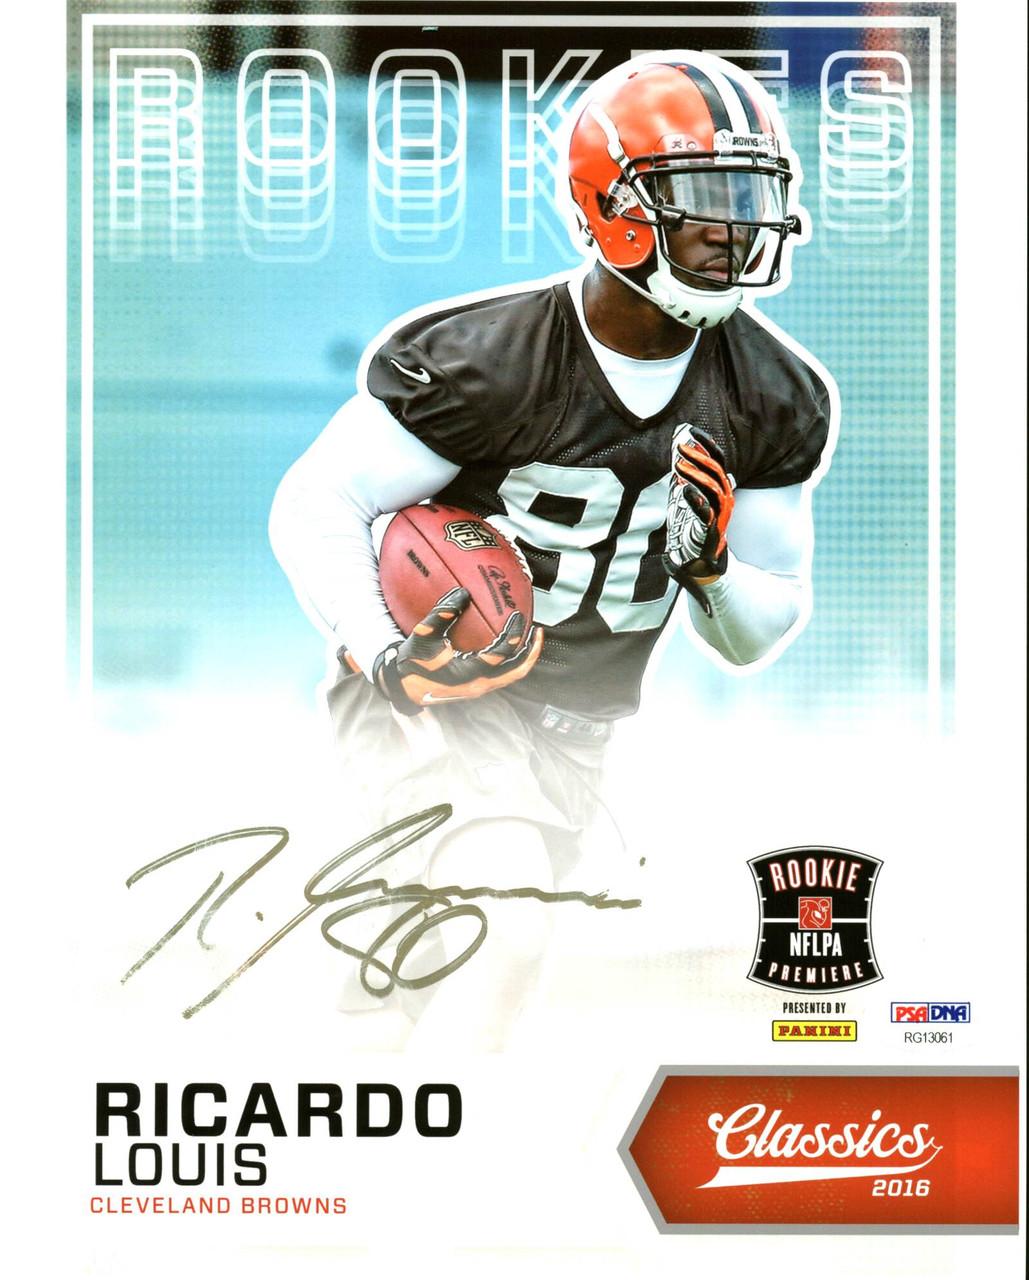 online store 14edf ea6ea Browns Ricardo Louis Authentic Signed 8X10 Photo Autographed PSA/DNA  #RG13061